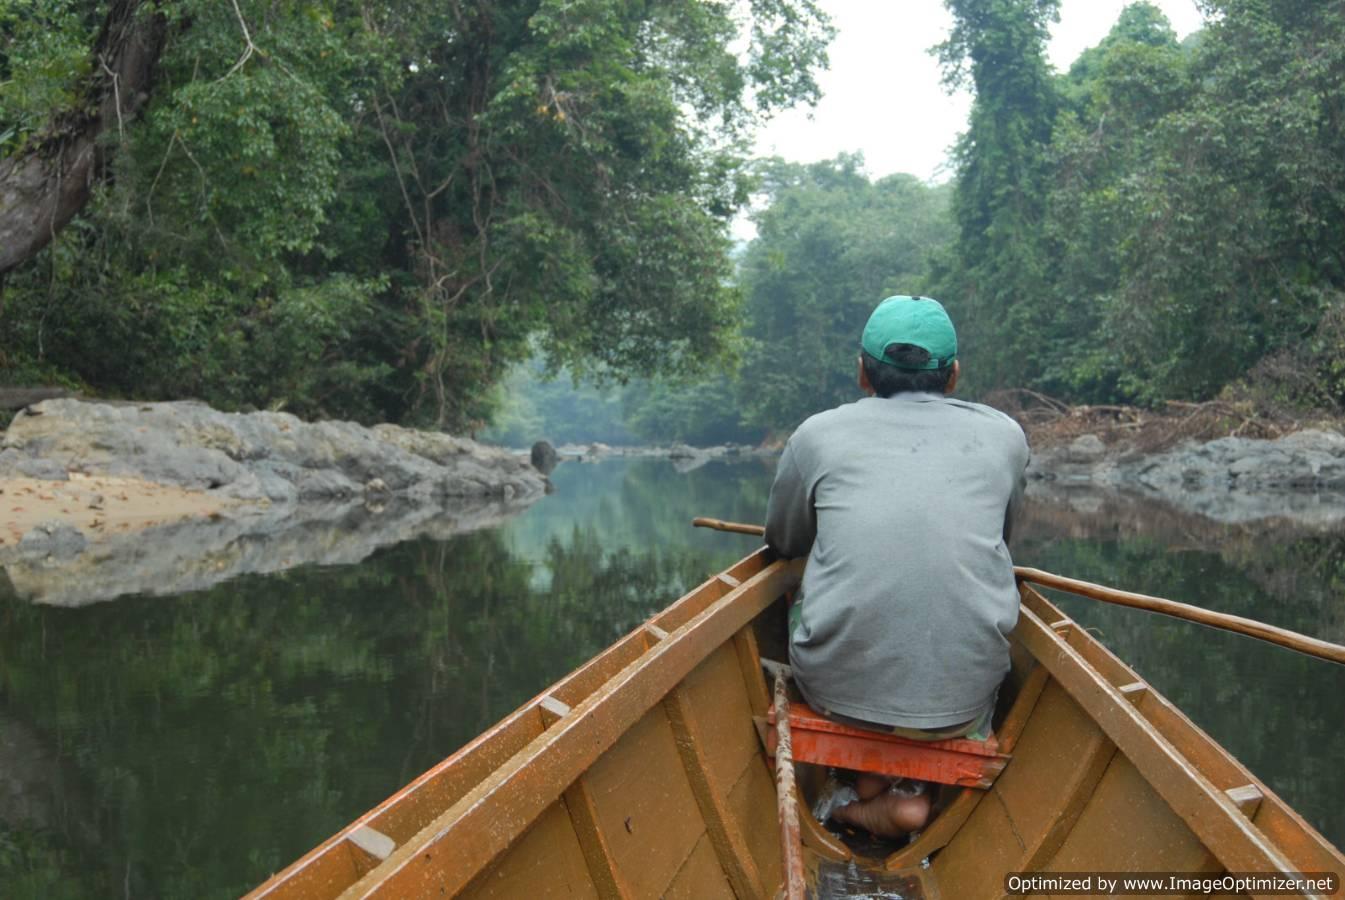 https://i2.wp.com/www.borneotourgigant.com/river.JPG